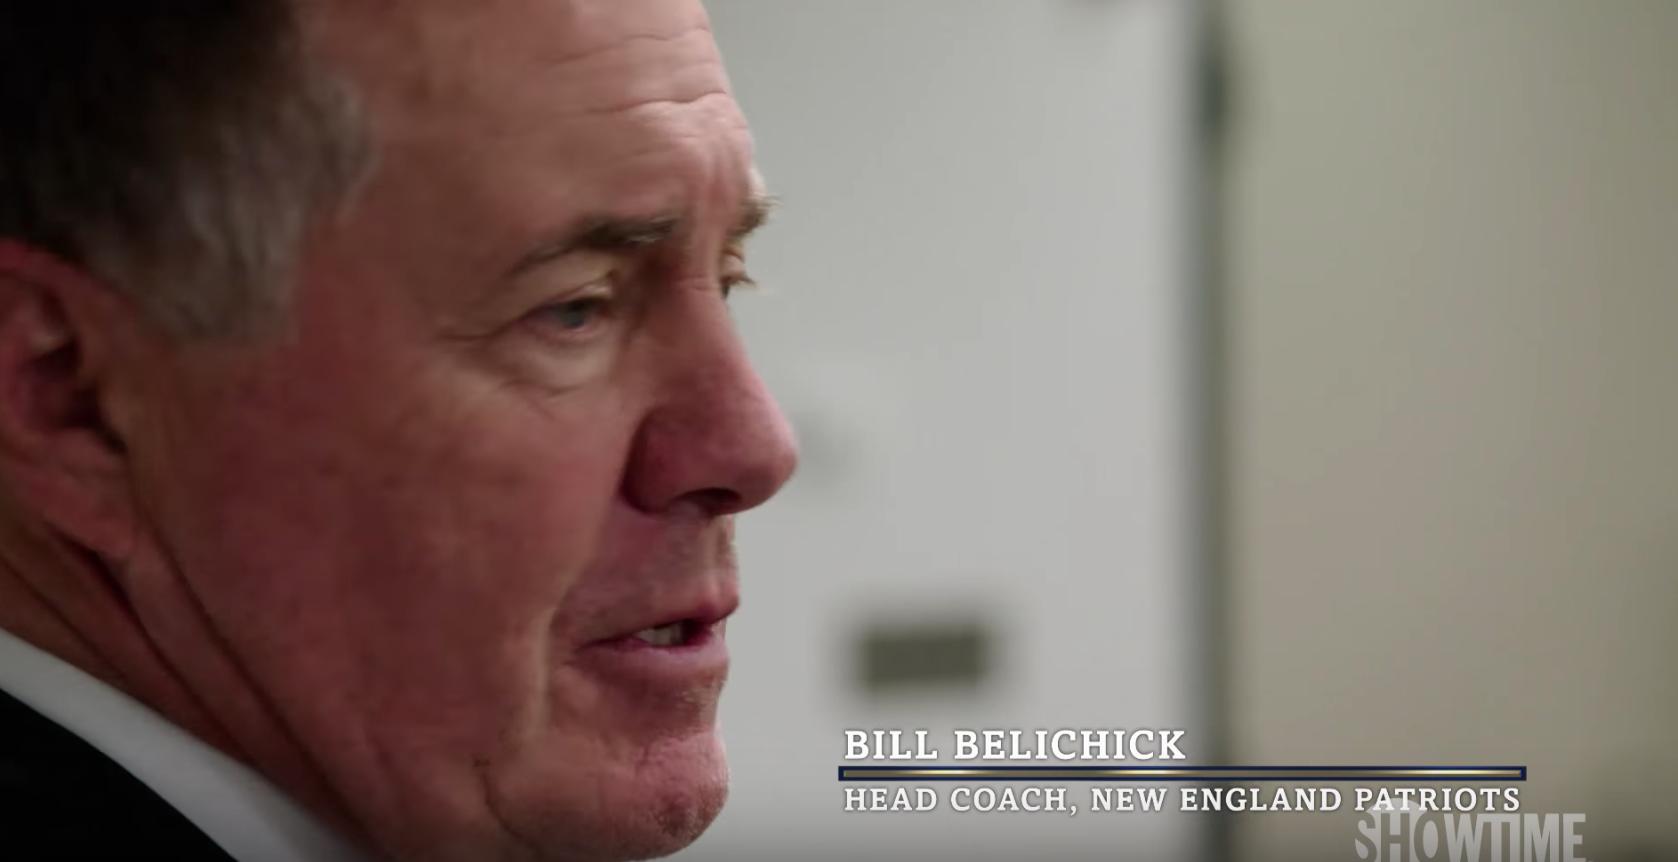 Bill Belichick Addresses the Midshipmen